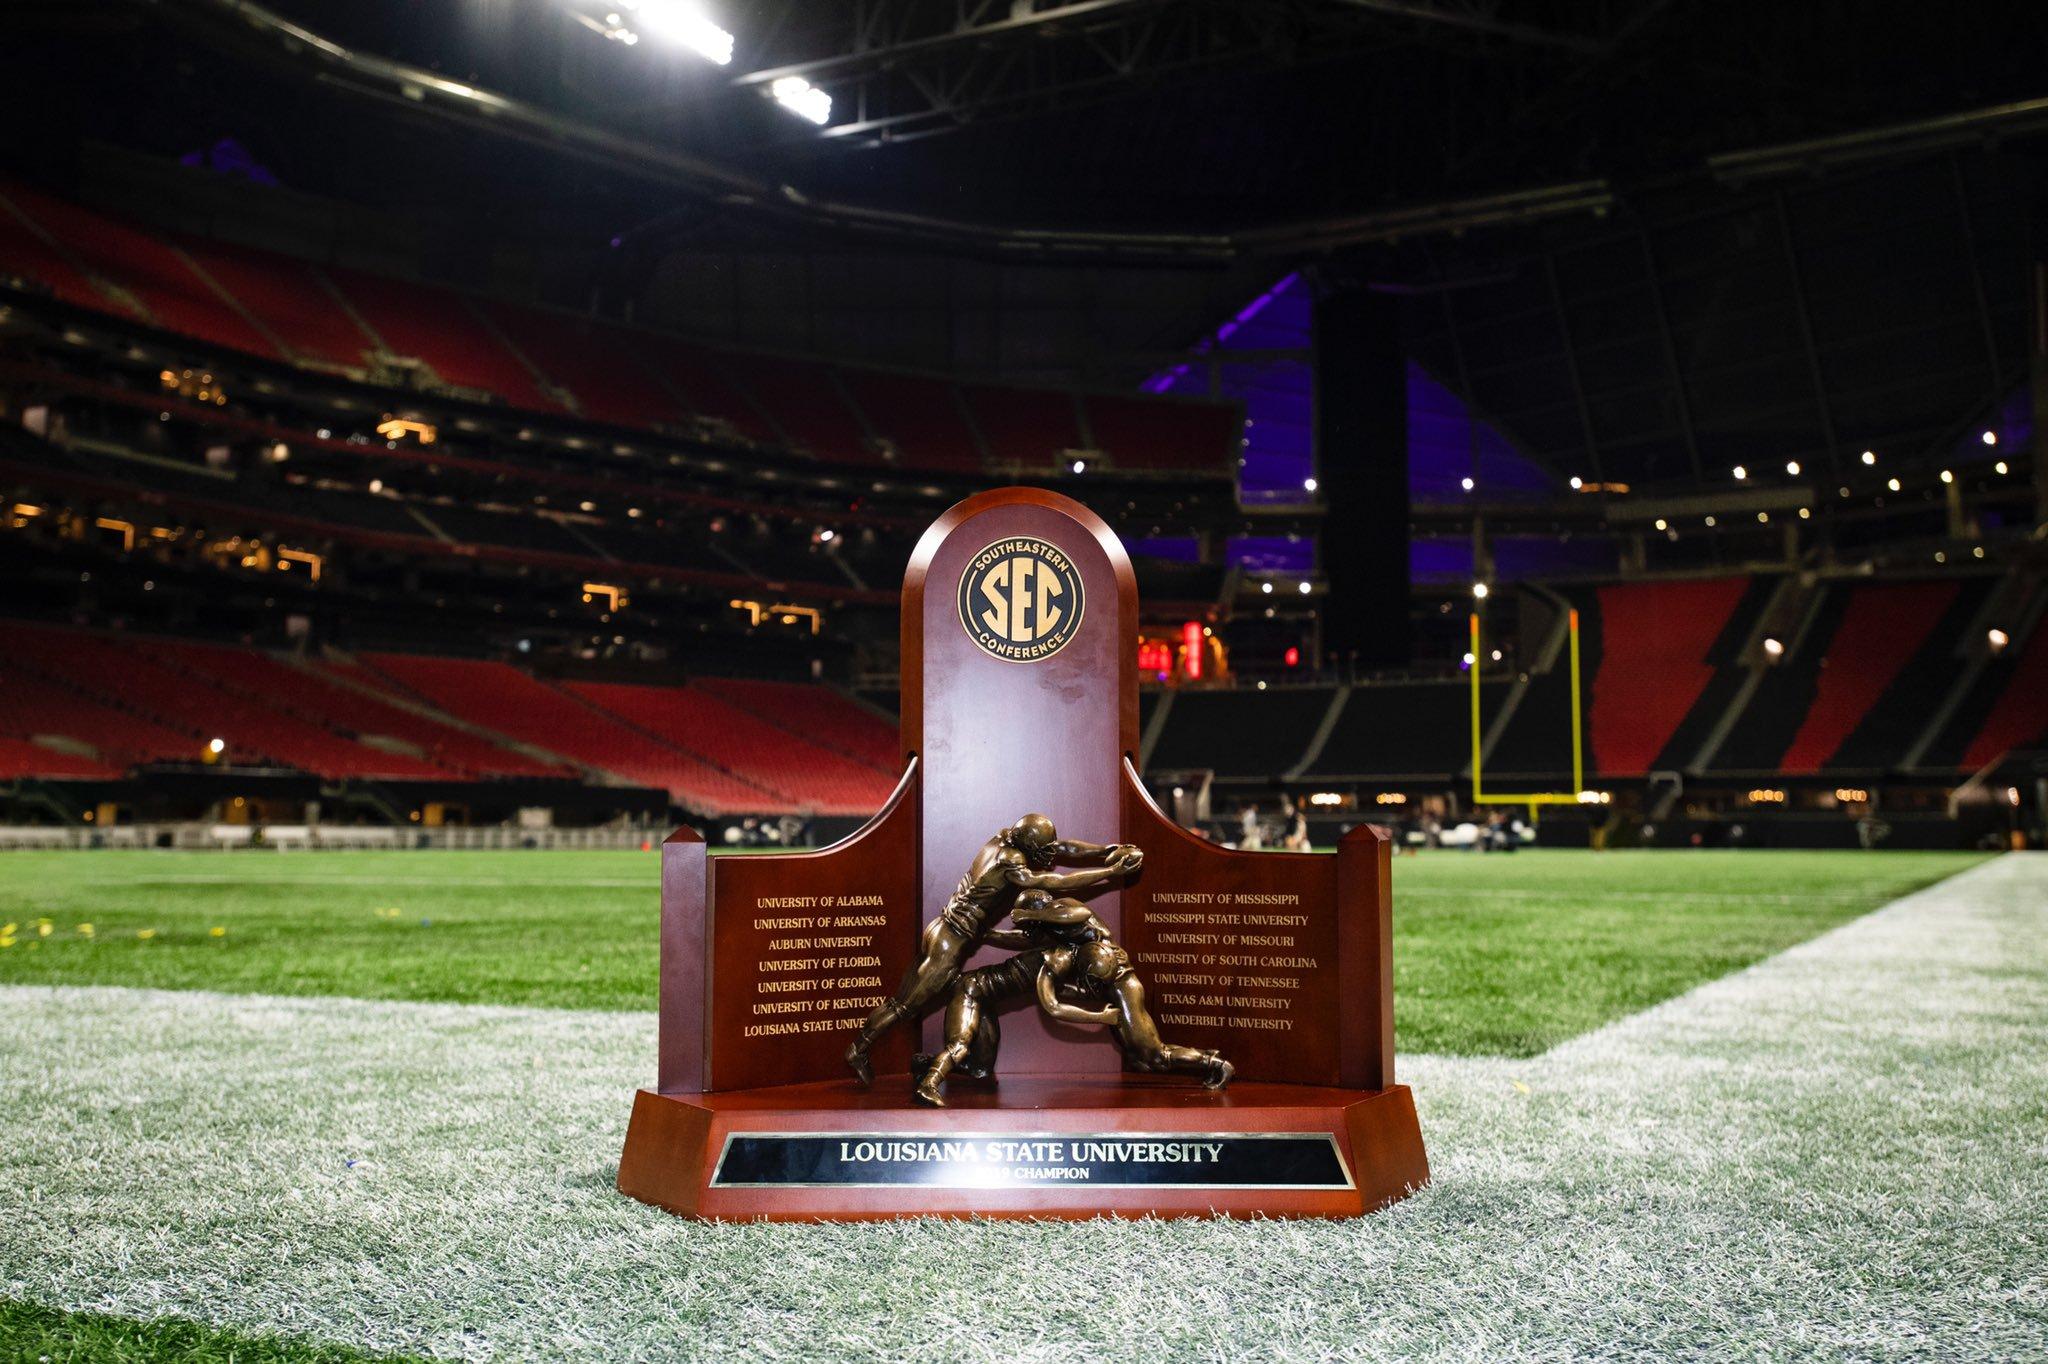 #2 LSU Trounces #4 Georgia To Win SEC Championship